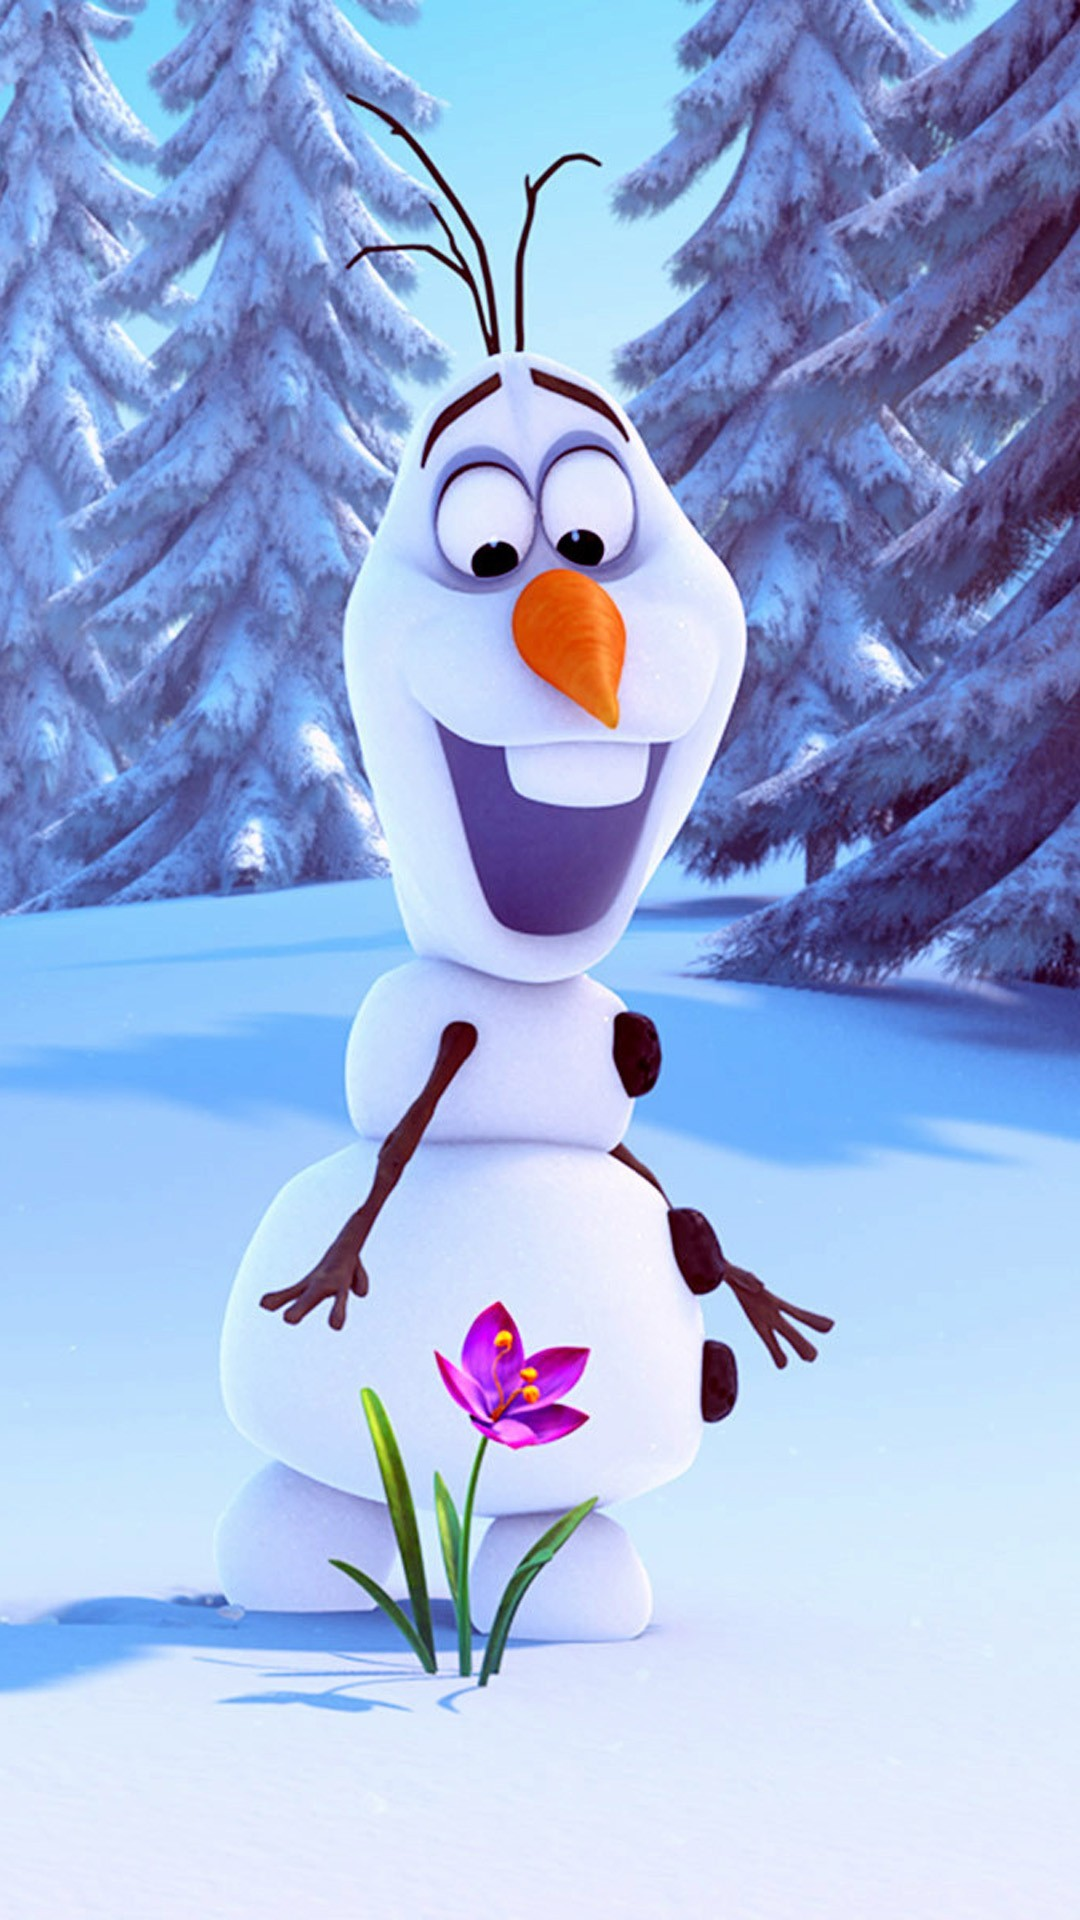 Olaf Frozen iPhone 6 plus wallpaper for 2014 Halloween – Flower, Snow  Trees, Wonderland